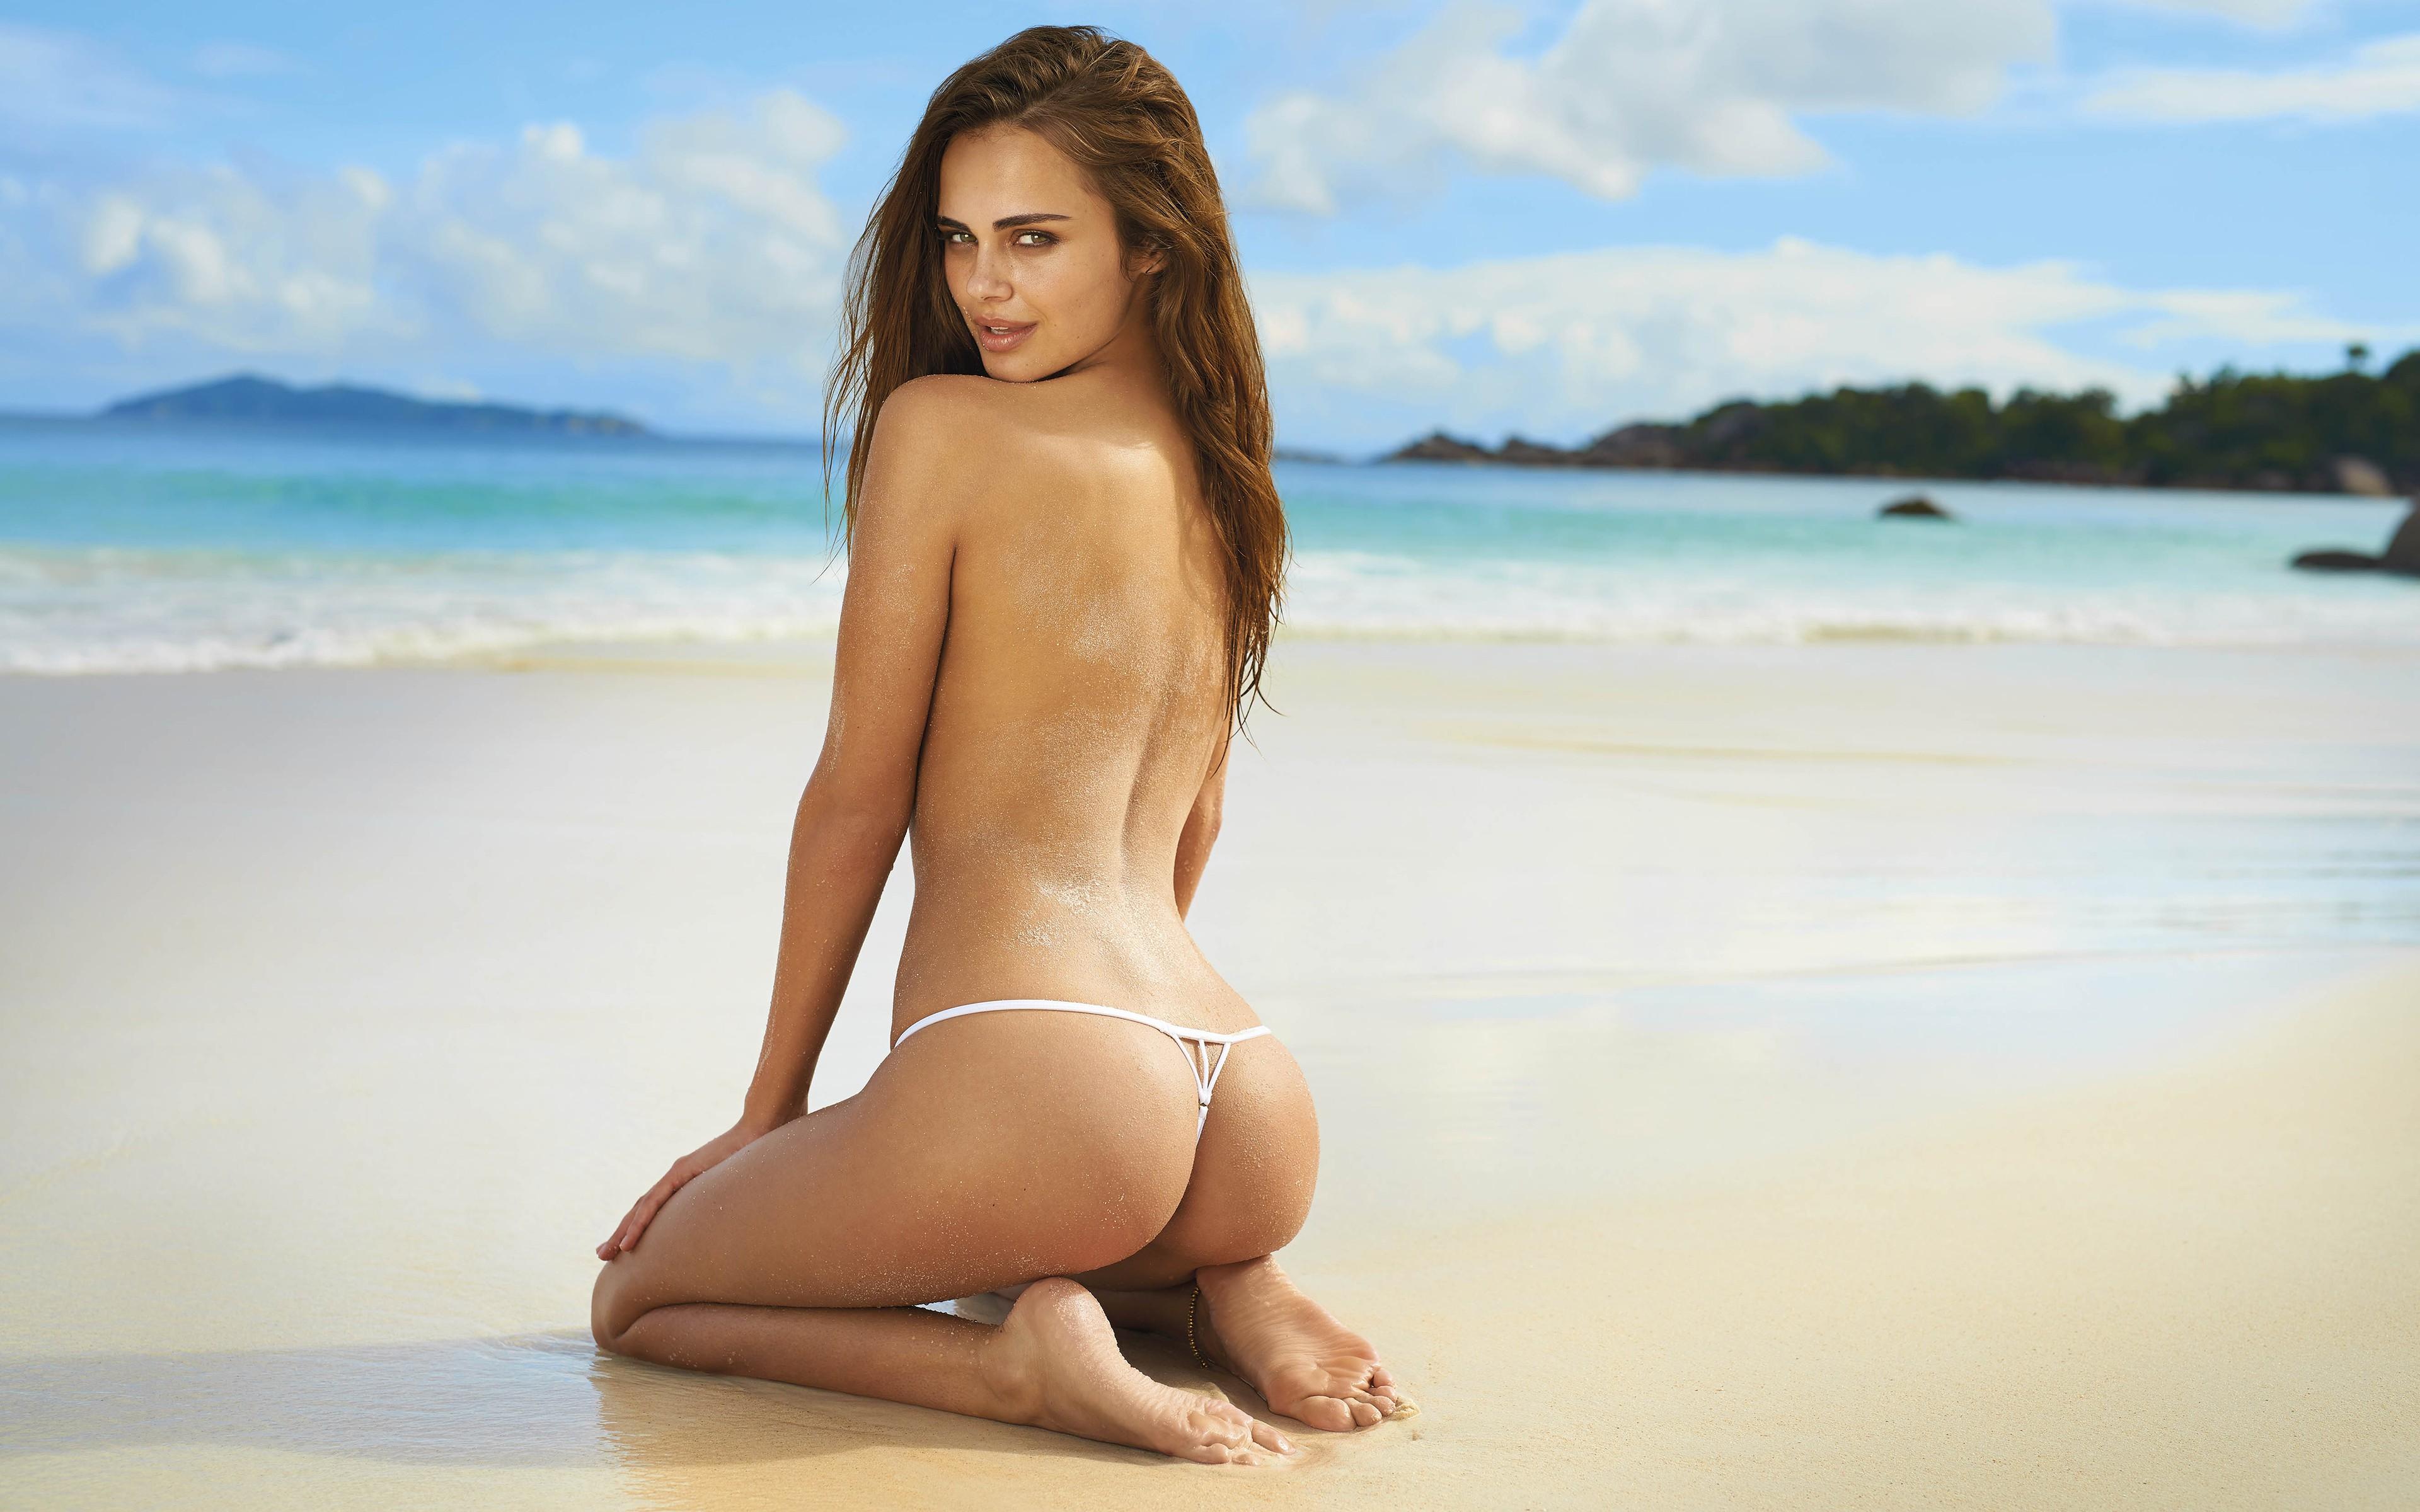 Female art nude body